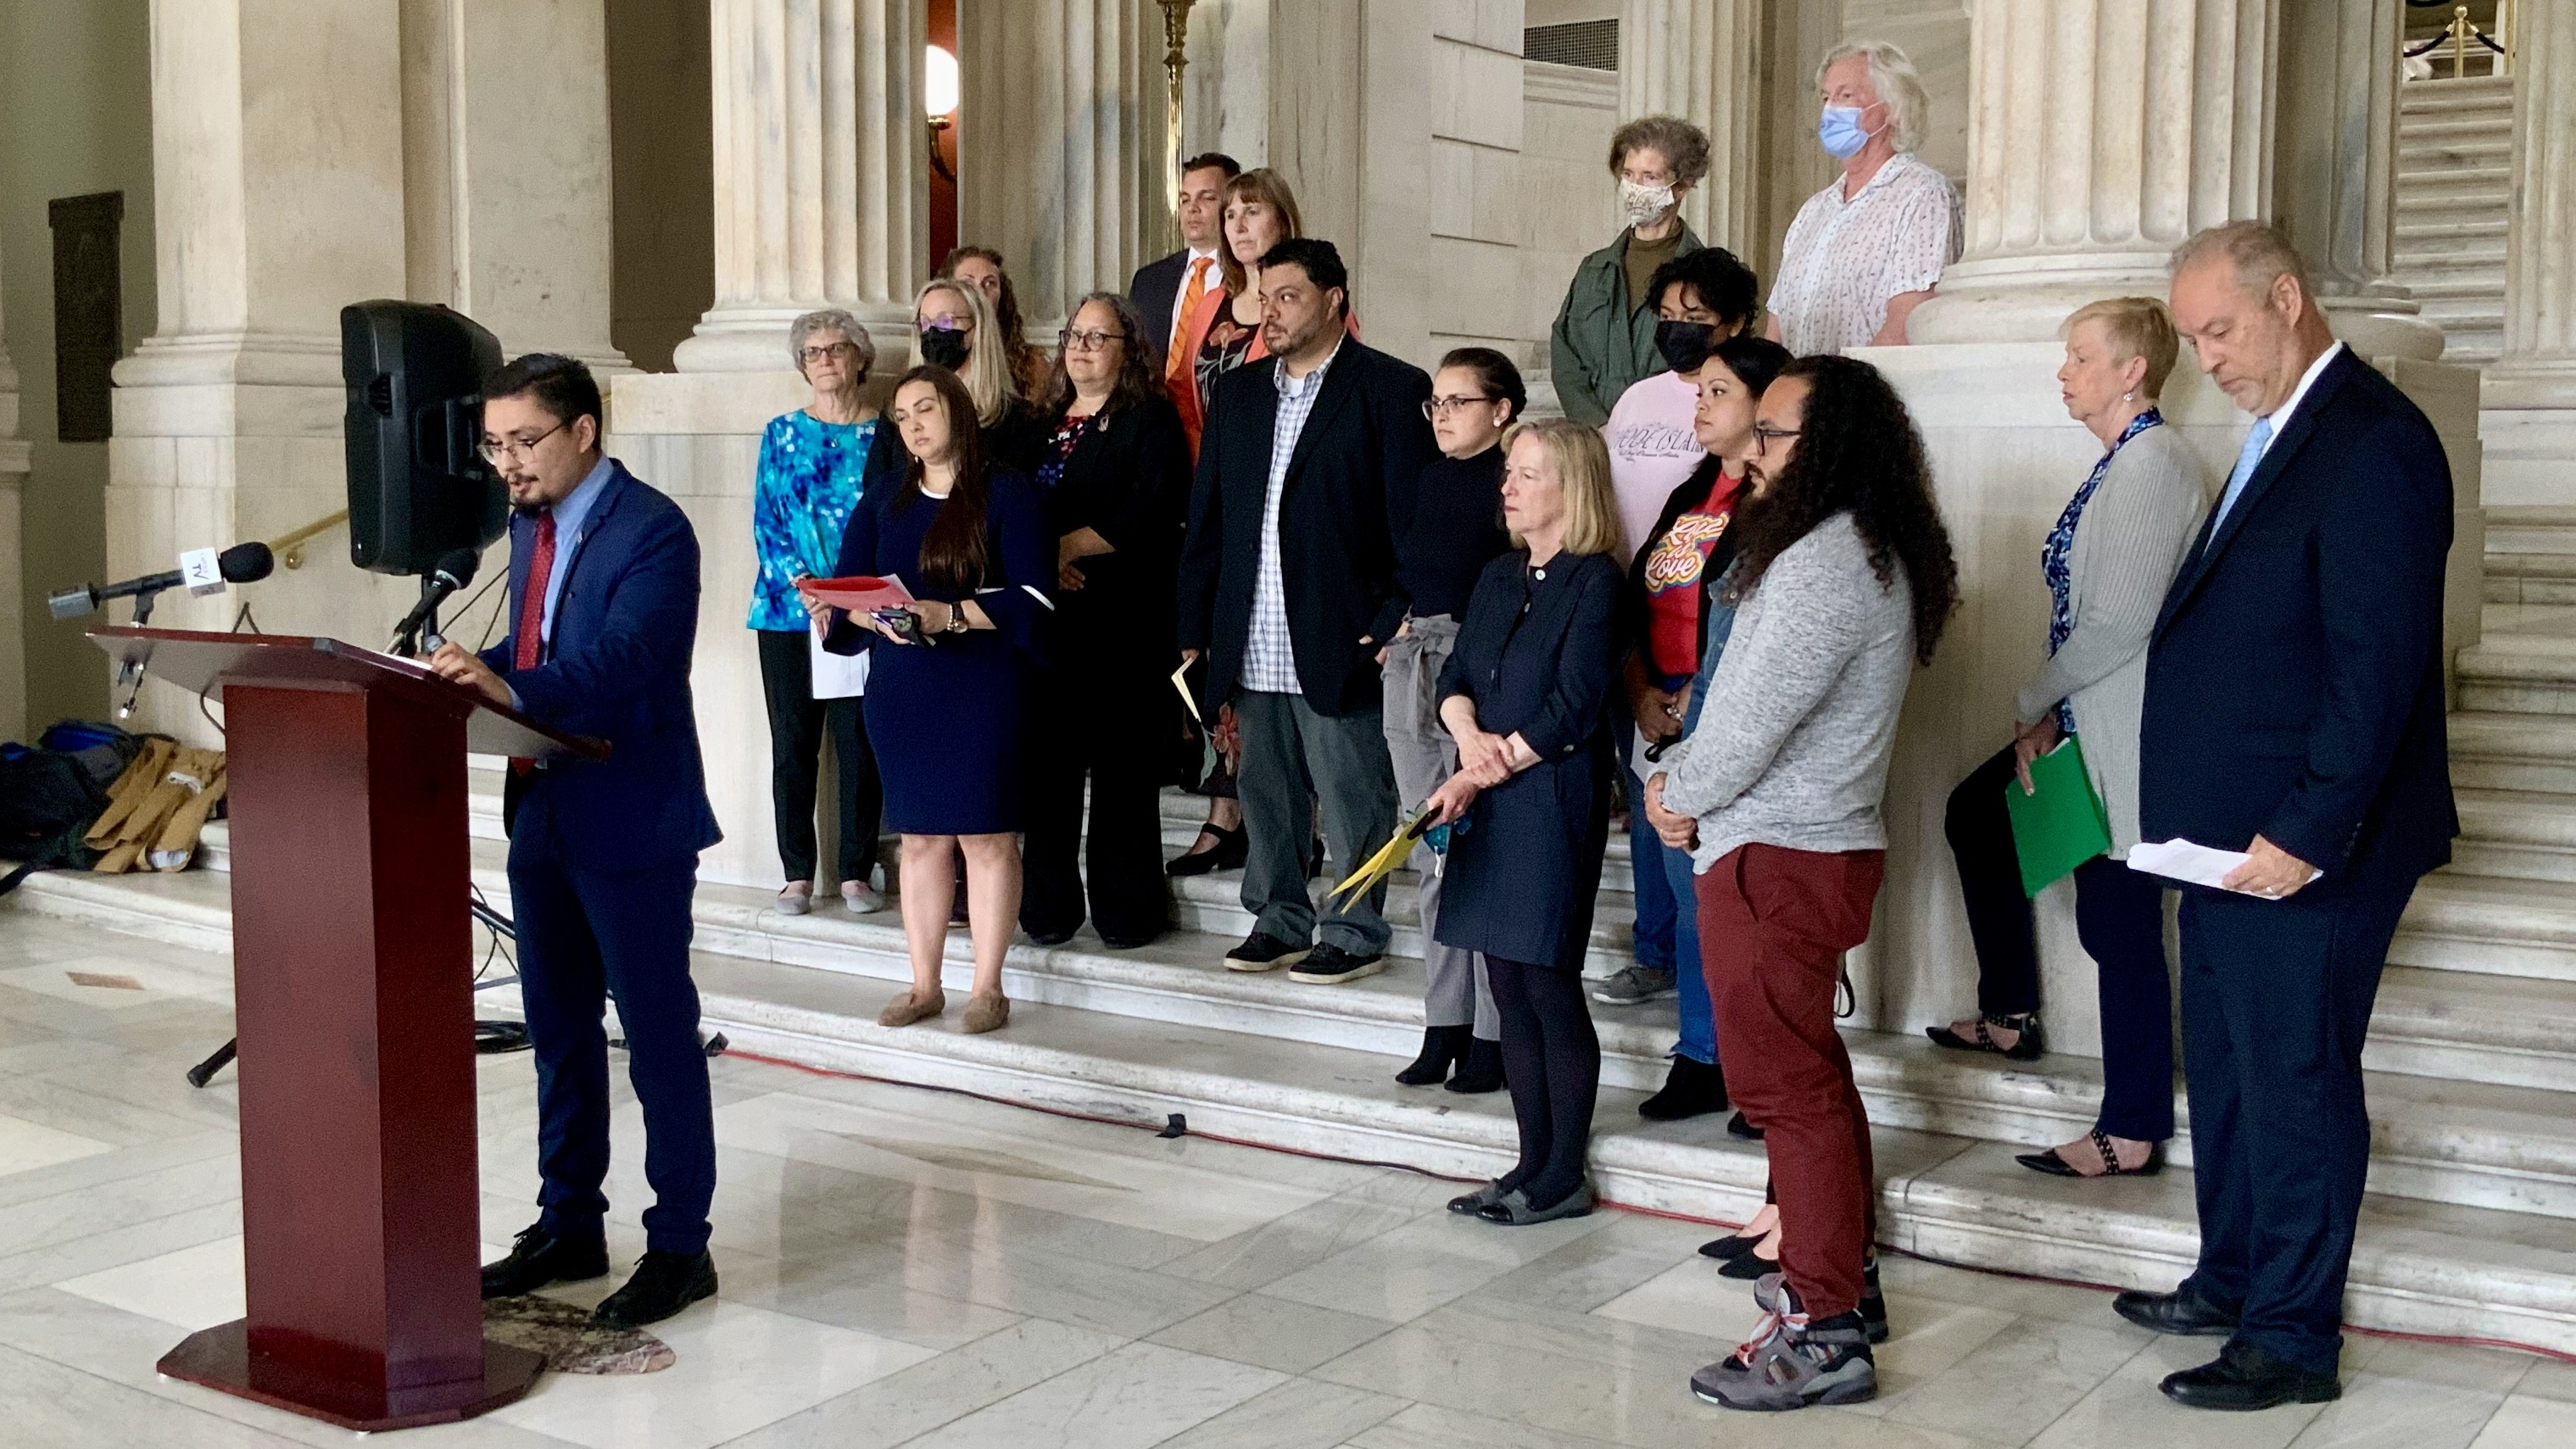 Photo for Advocates push to provide health insurance for all RI children, regardless of immigration status